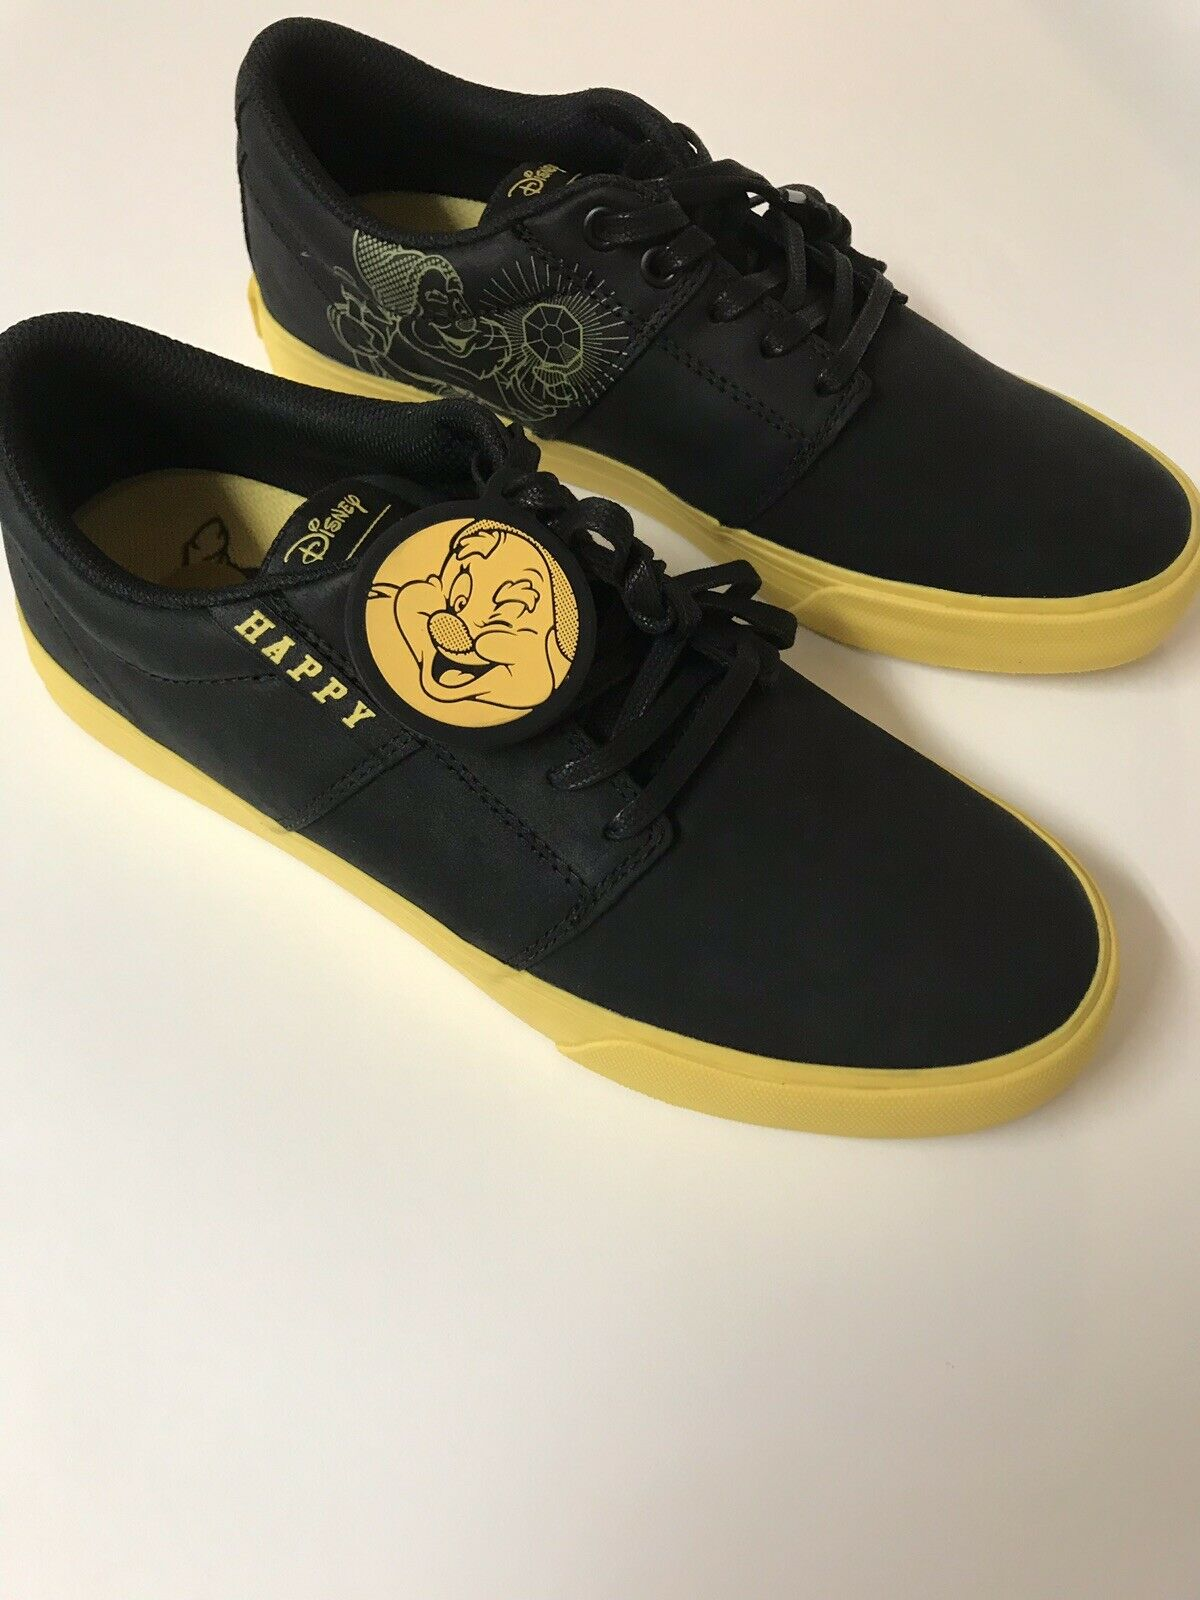 Zapatos Supra Disney Feliz blancoanieves Siete Enanos Talla 8 Moda Tenis